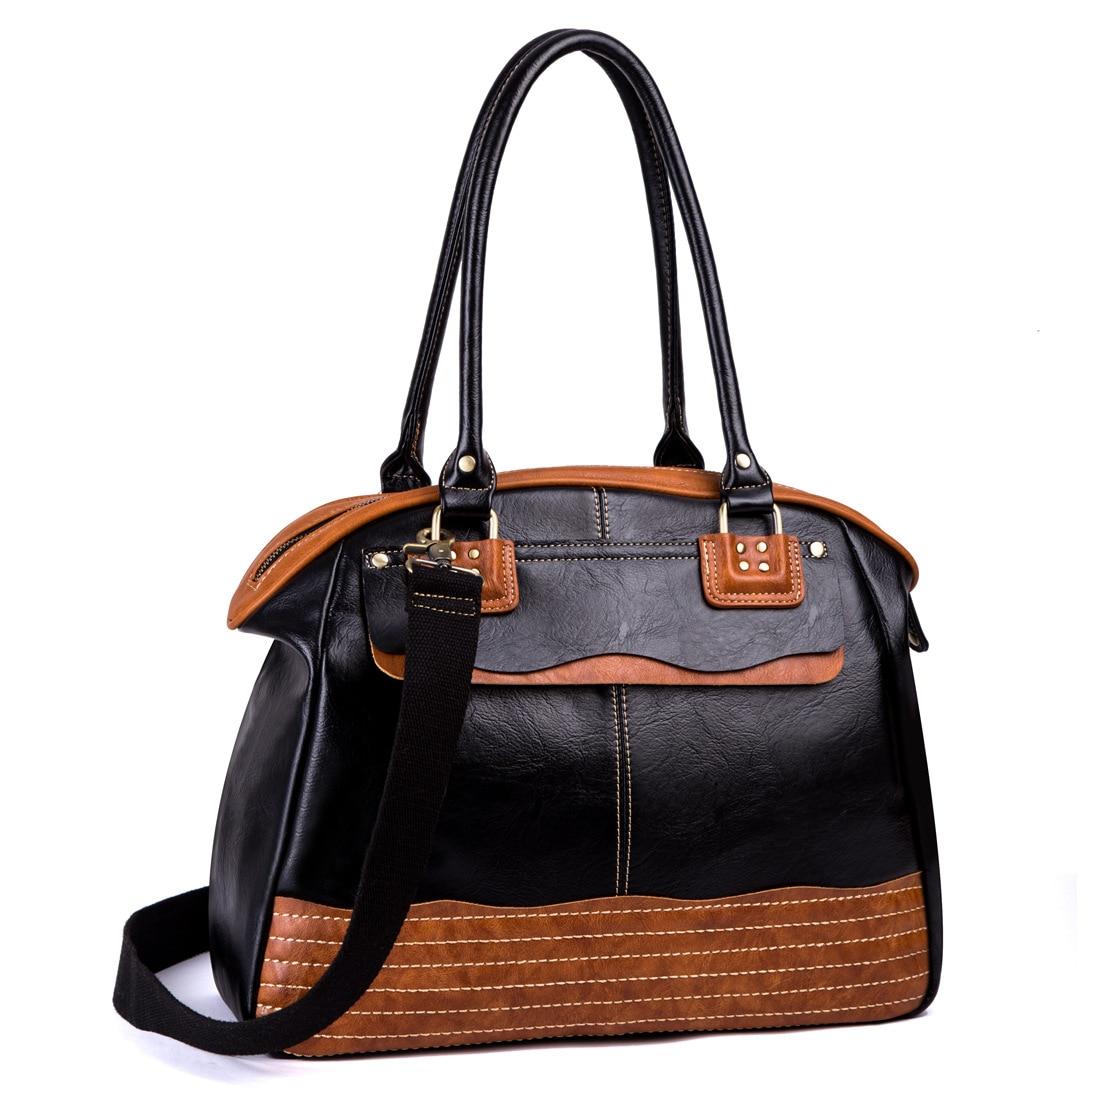 Casual Style Men Shoulder Bag Large Capacity Briefcase Bag Office Handbag Top Designer Office Handbag Luxury Messenger Bags